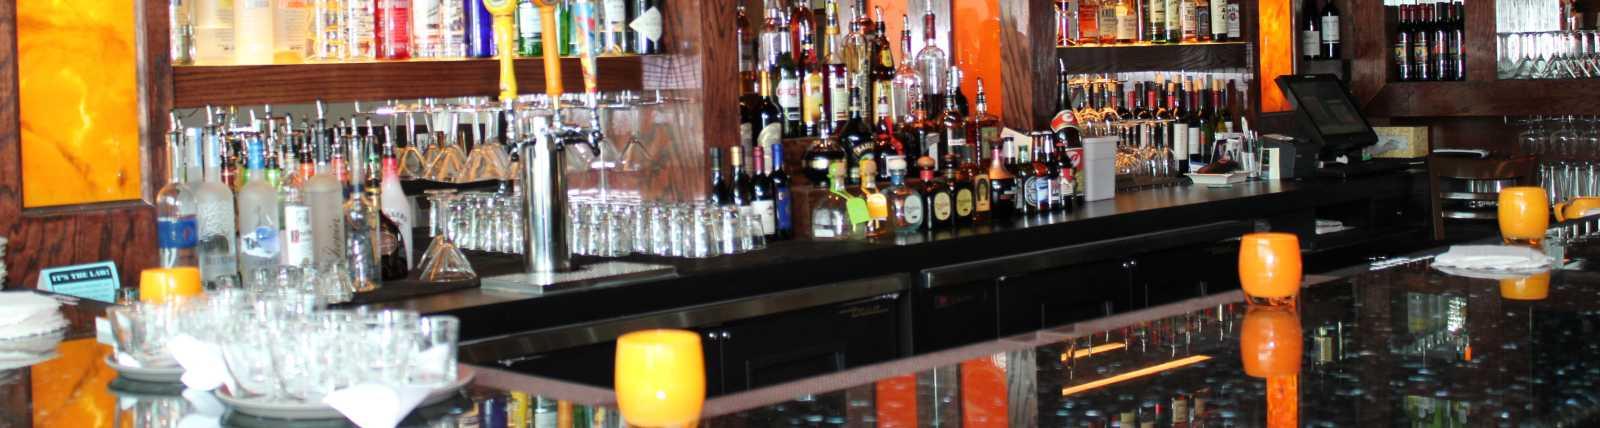 Mango_Thai_Cuisine___Bar-6.JPG